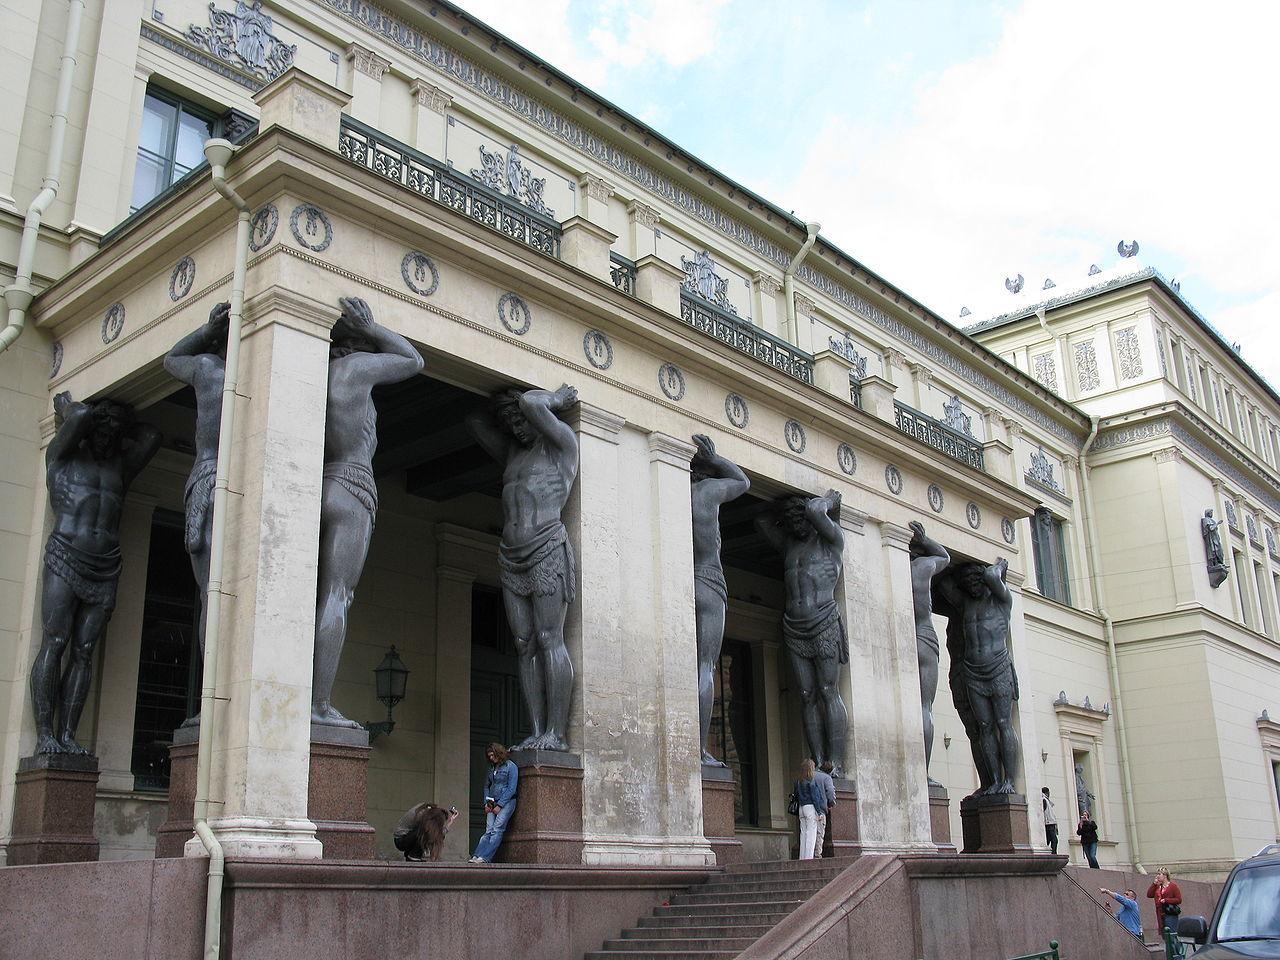 Портик Нового Эрмитажа с атлантами. Фото: Andrew Bossi (Wikimedia Commons)